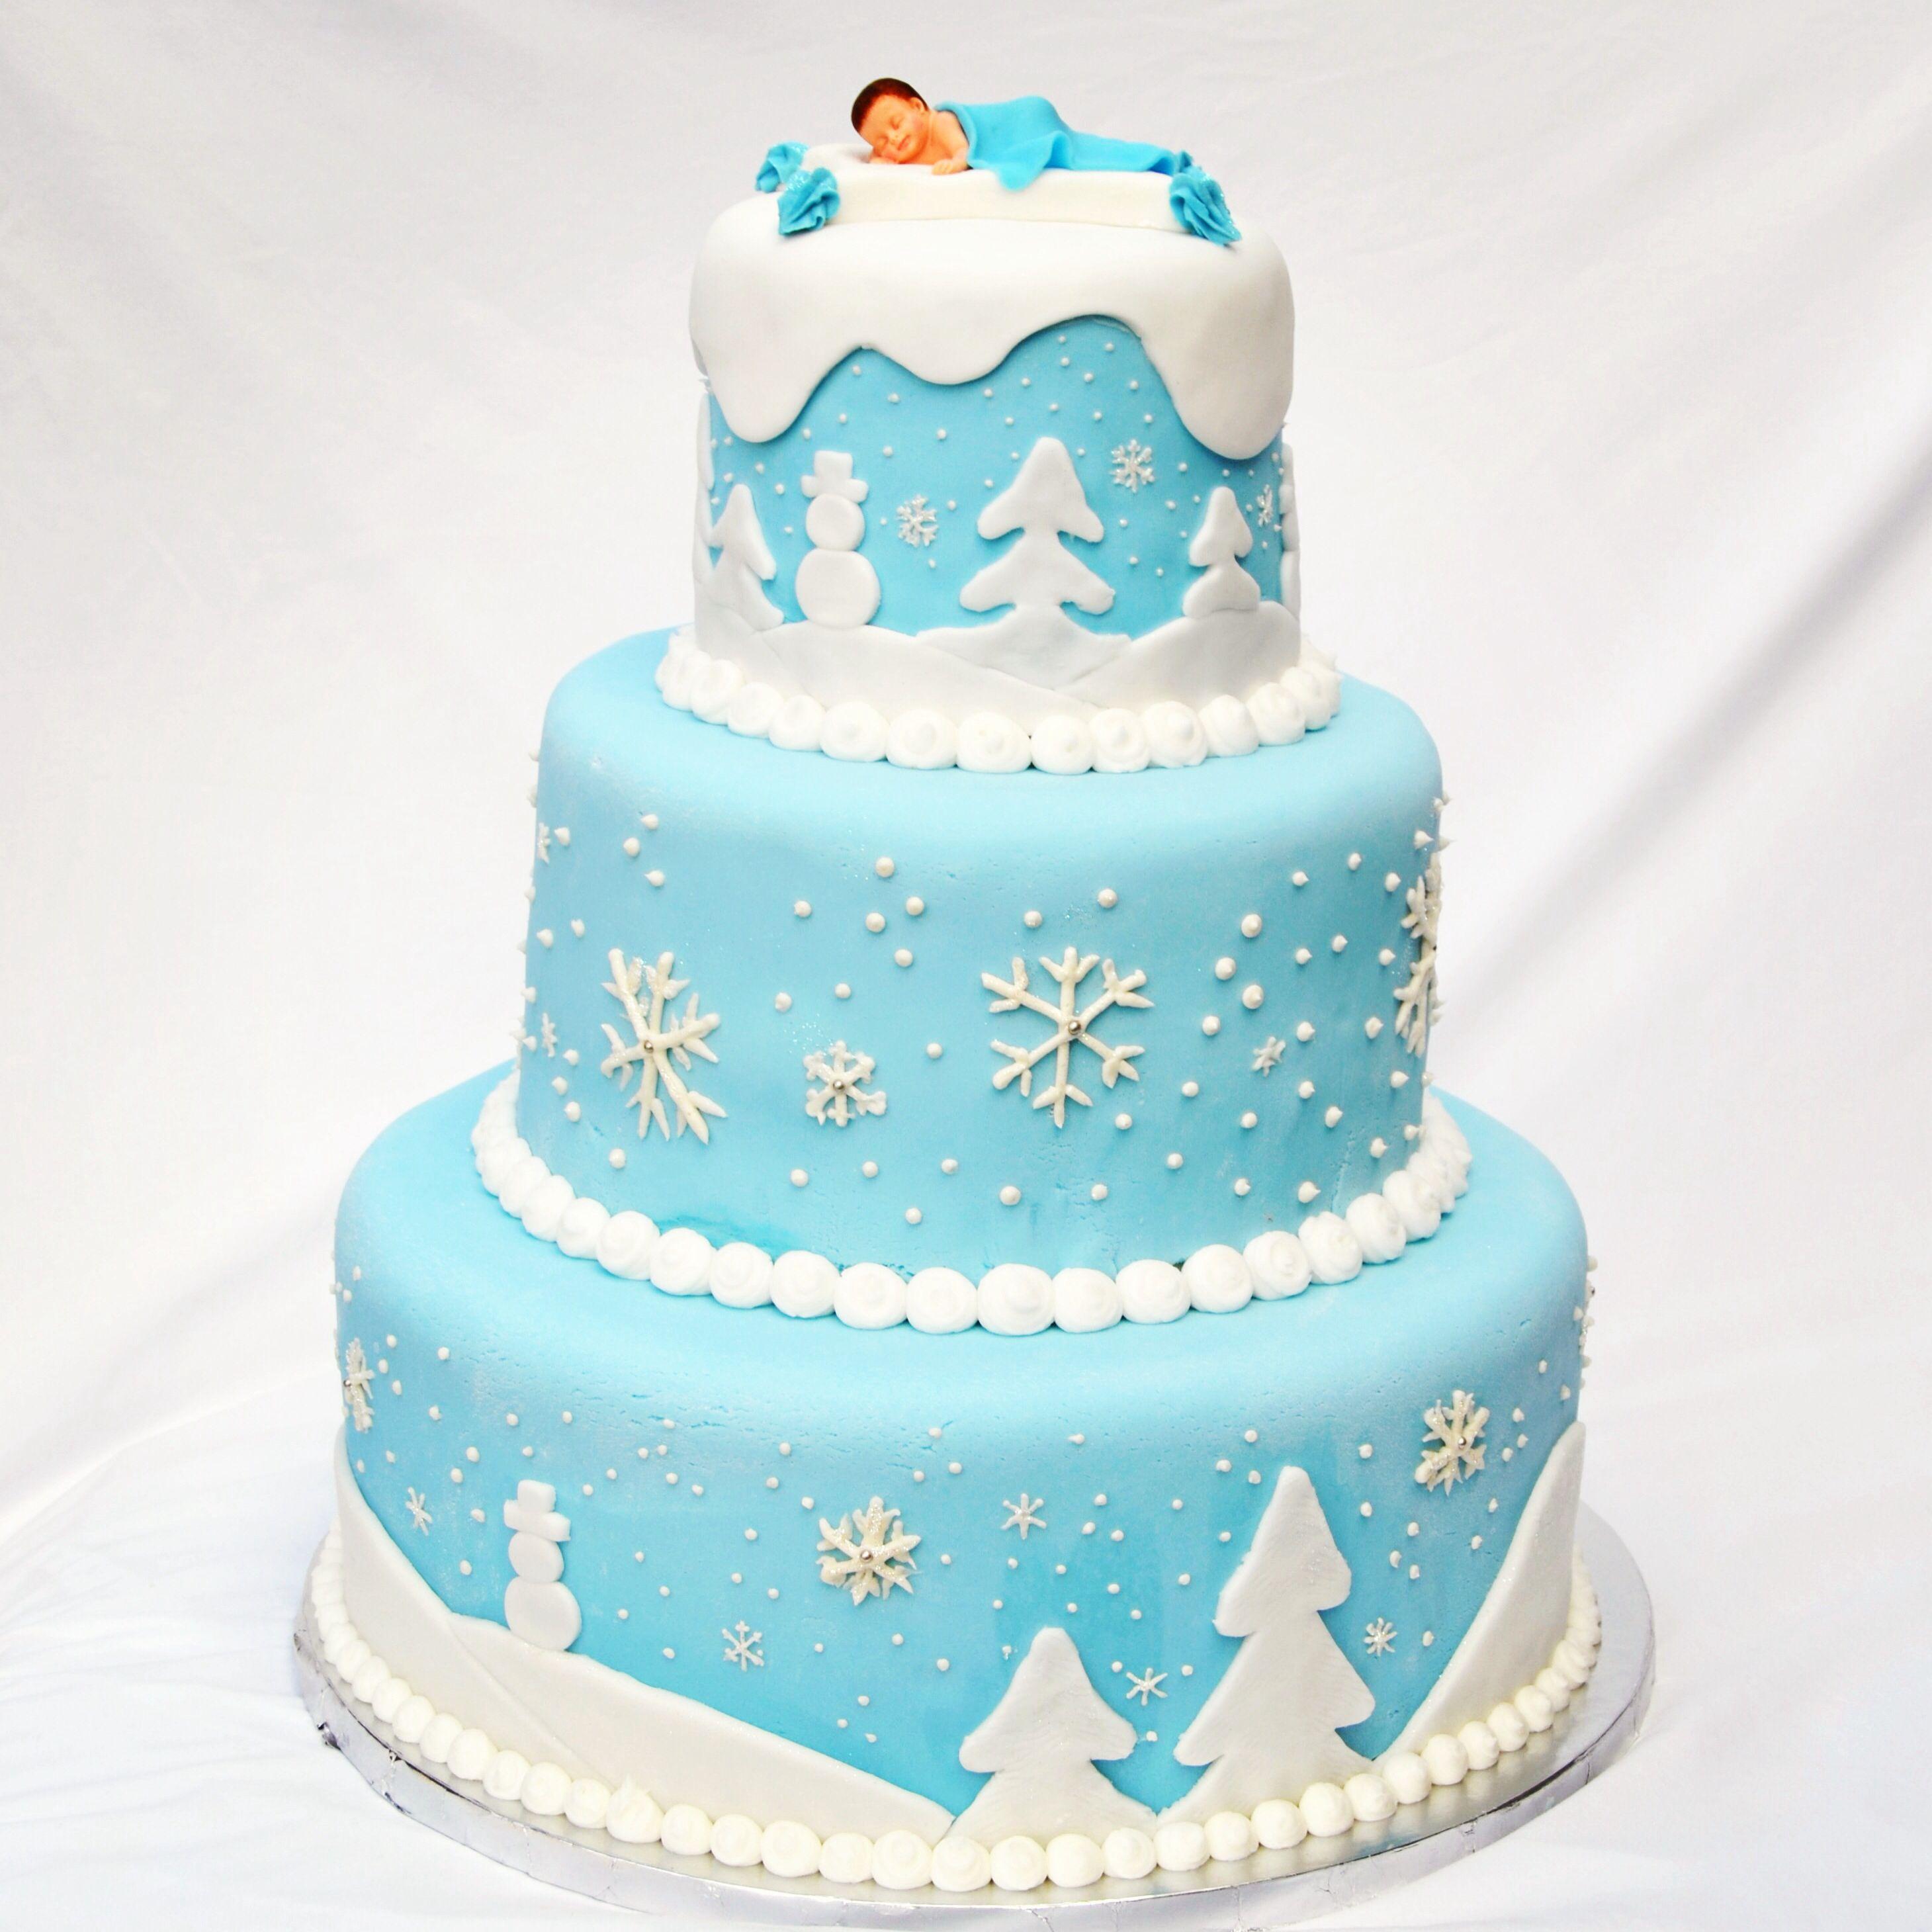 Winter Wonderland Baby Shower Cake   From Bakemiacake.com